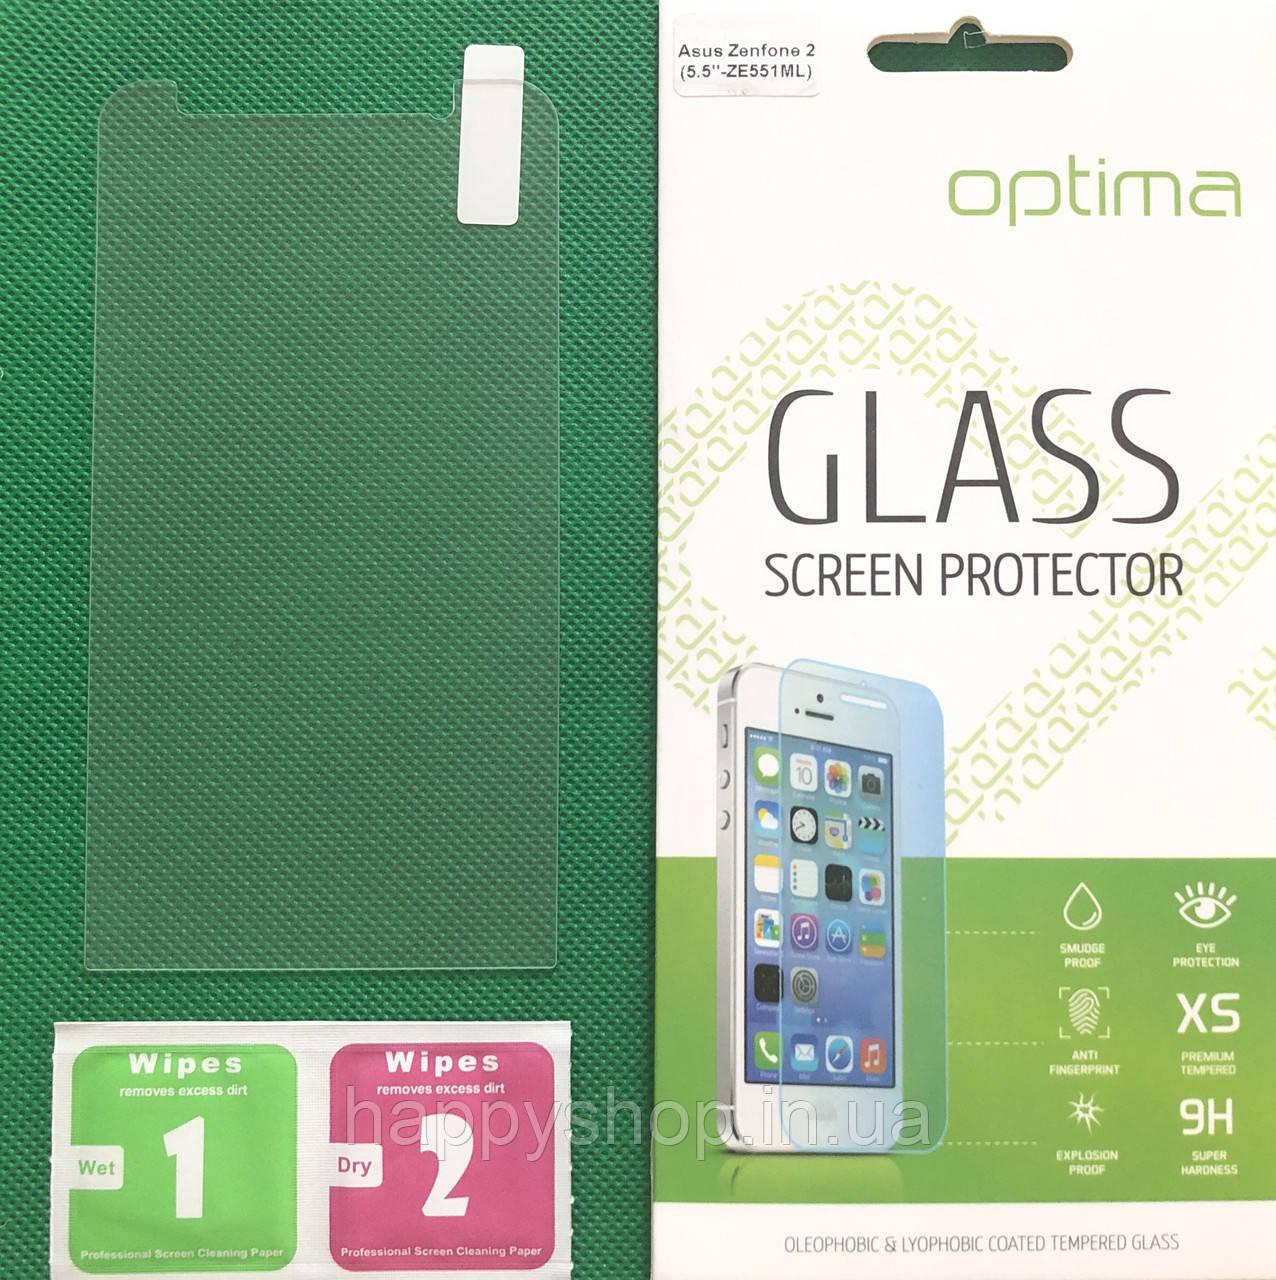 "Защитное стекло для Asus Zenfone 2 (5.5""-ZE551ML)"